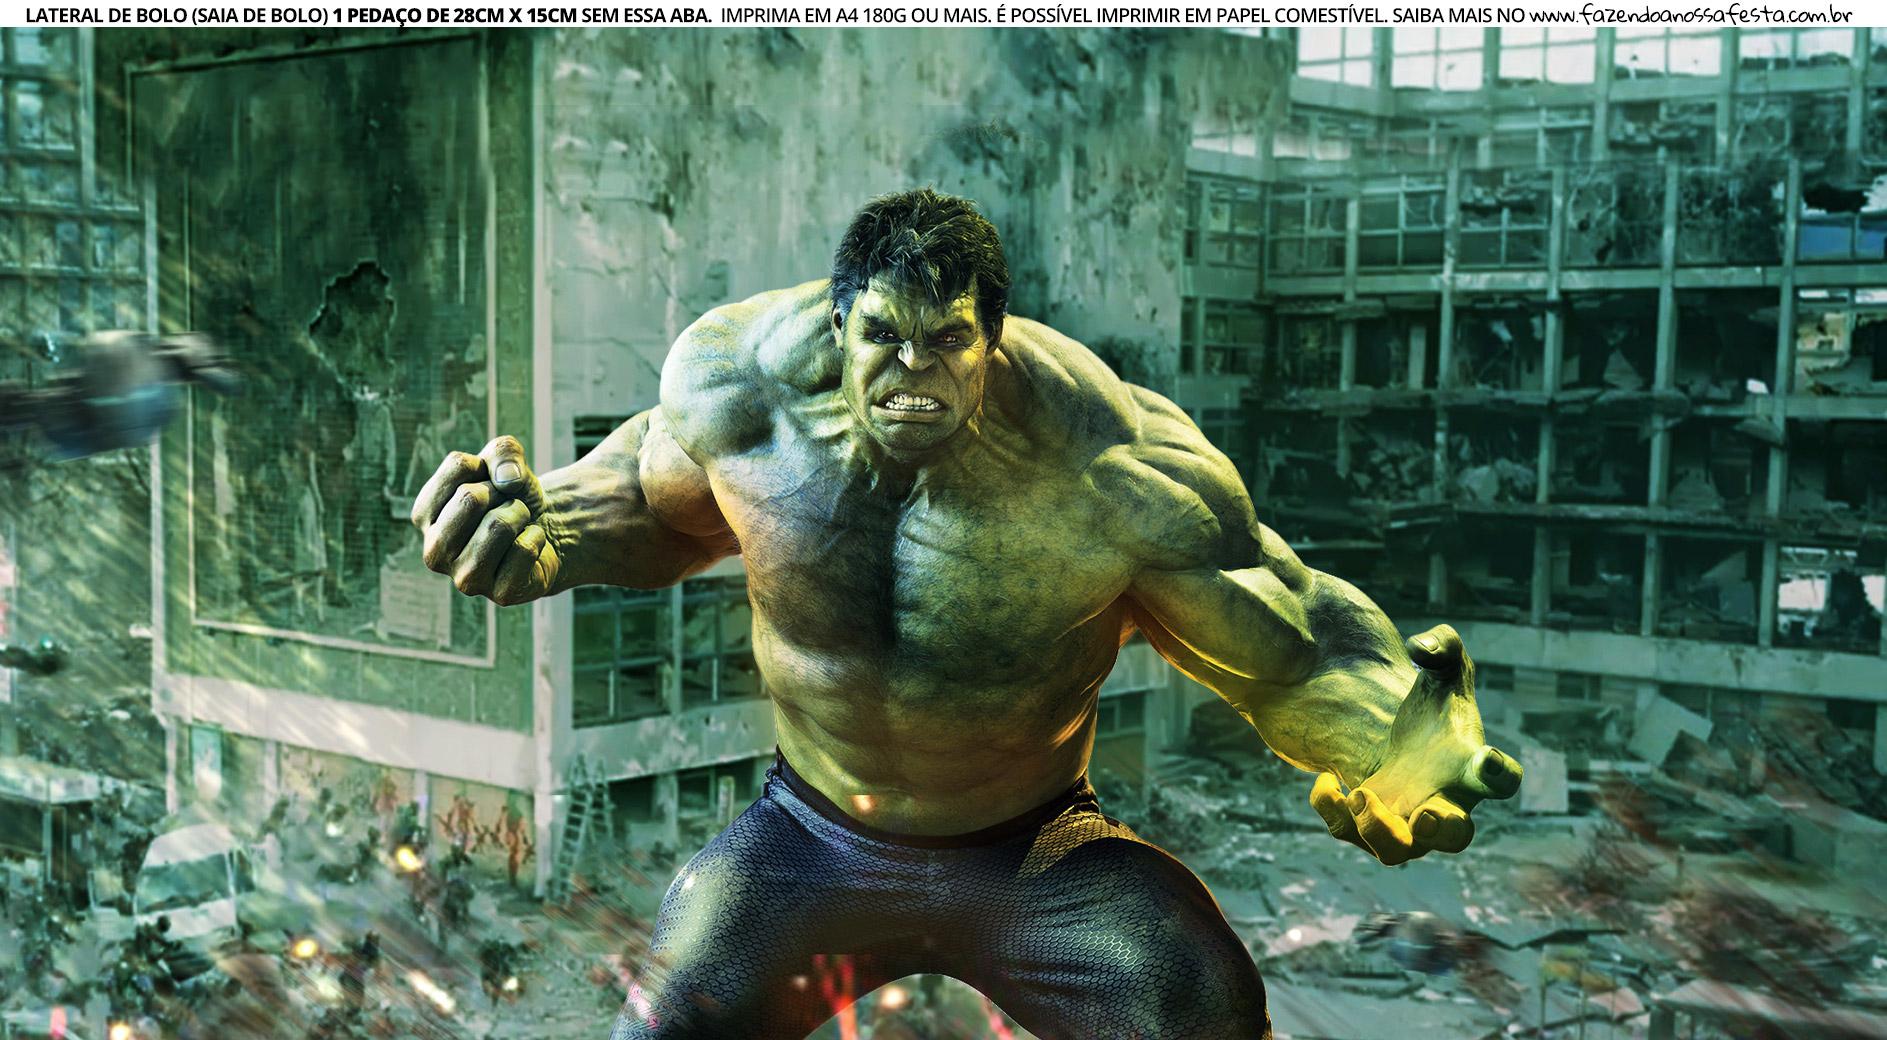 Faixa Lateral para Bolo Hulk 8